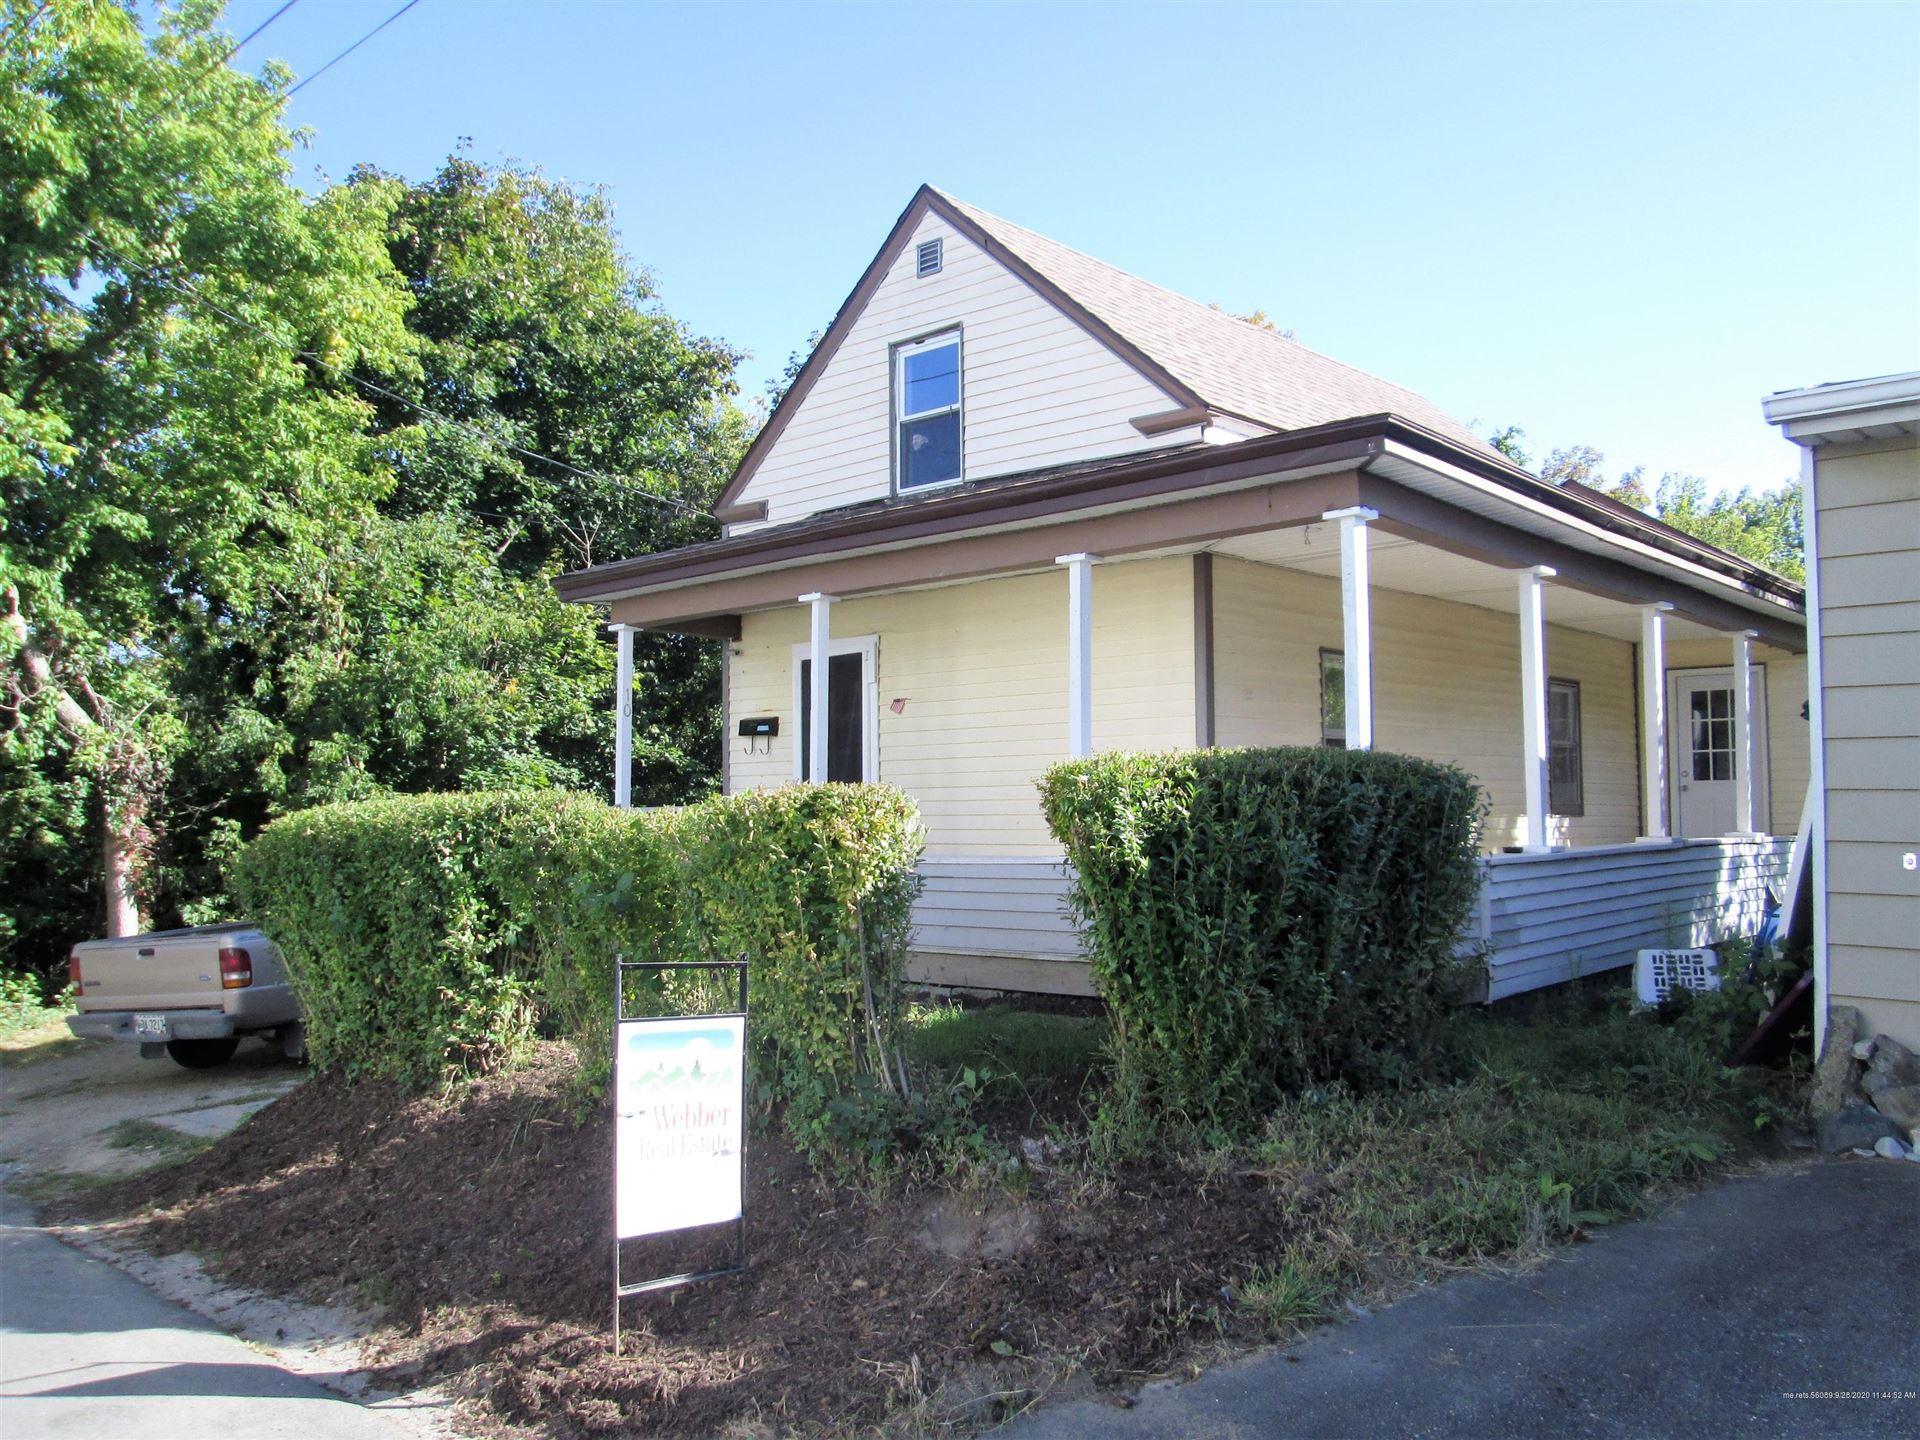 Photo of 10 Hudson Street, Augusta, ME 04330 (MLS # 1470062)